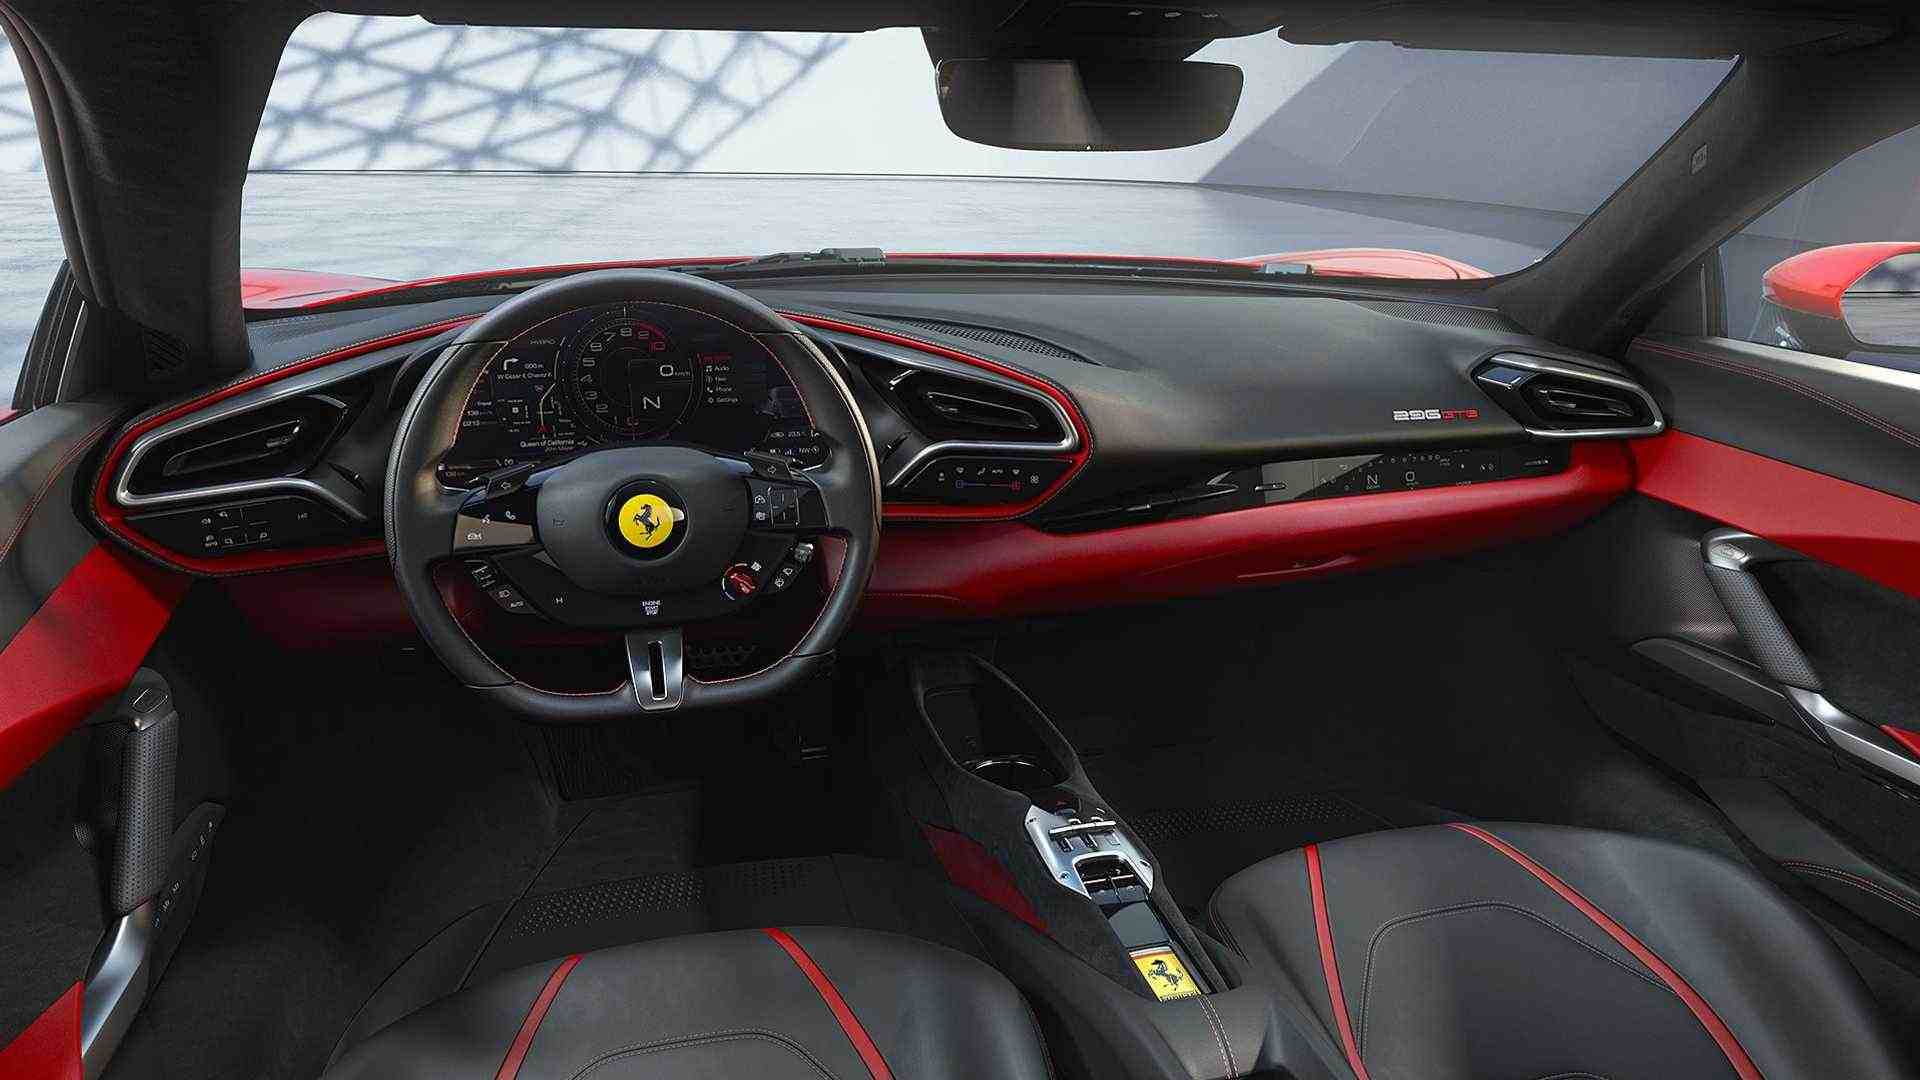 A peek inside the Ferrari 296 GTB. Image: Ferrari